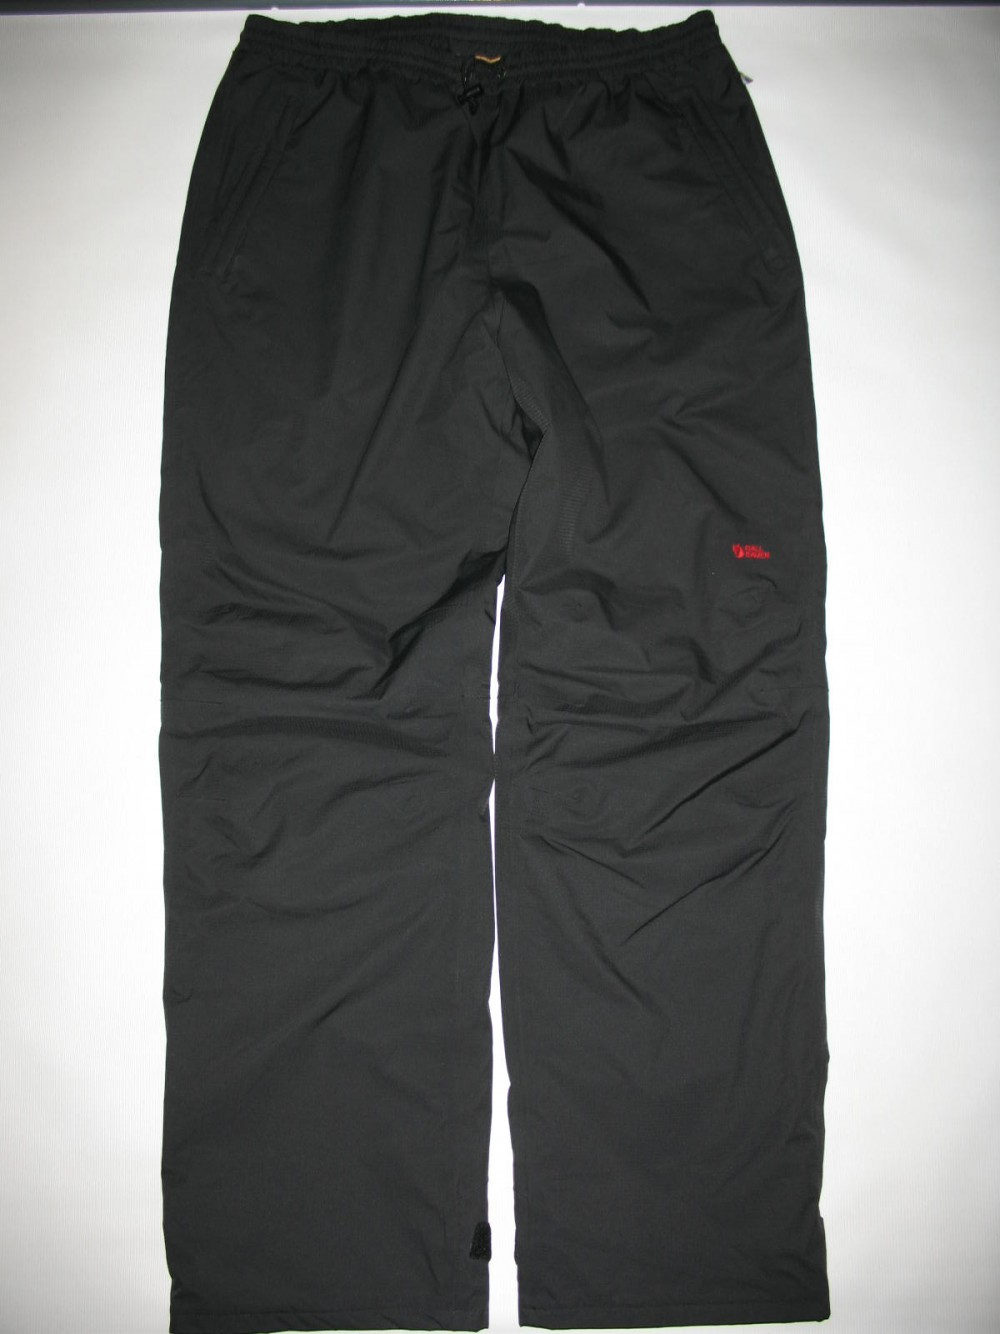 Штаны FJALLRAVEN element pants (размер XL/XXL) - 1